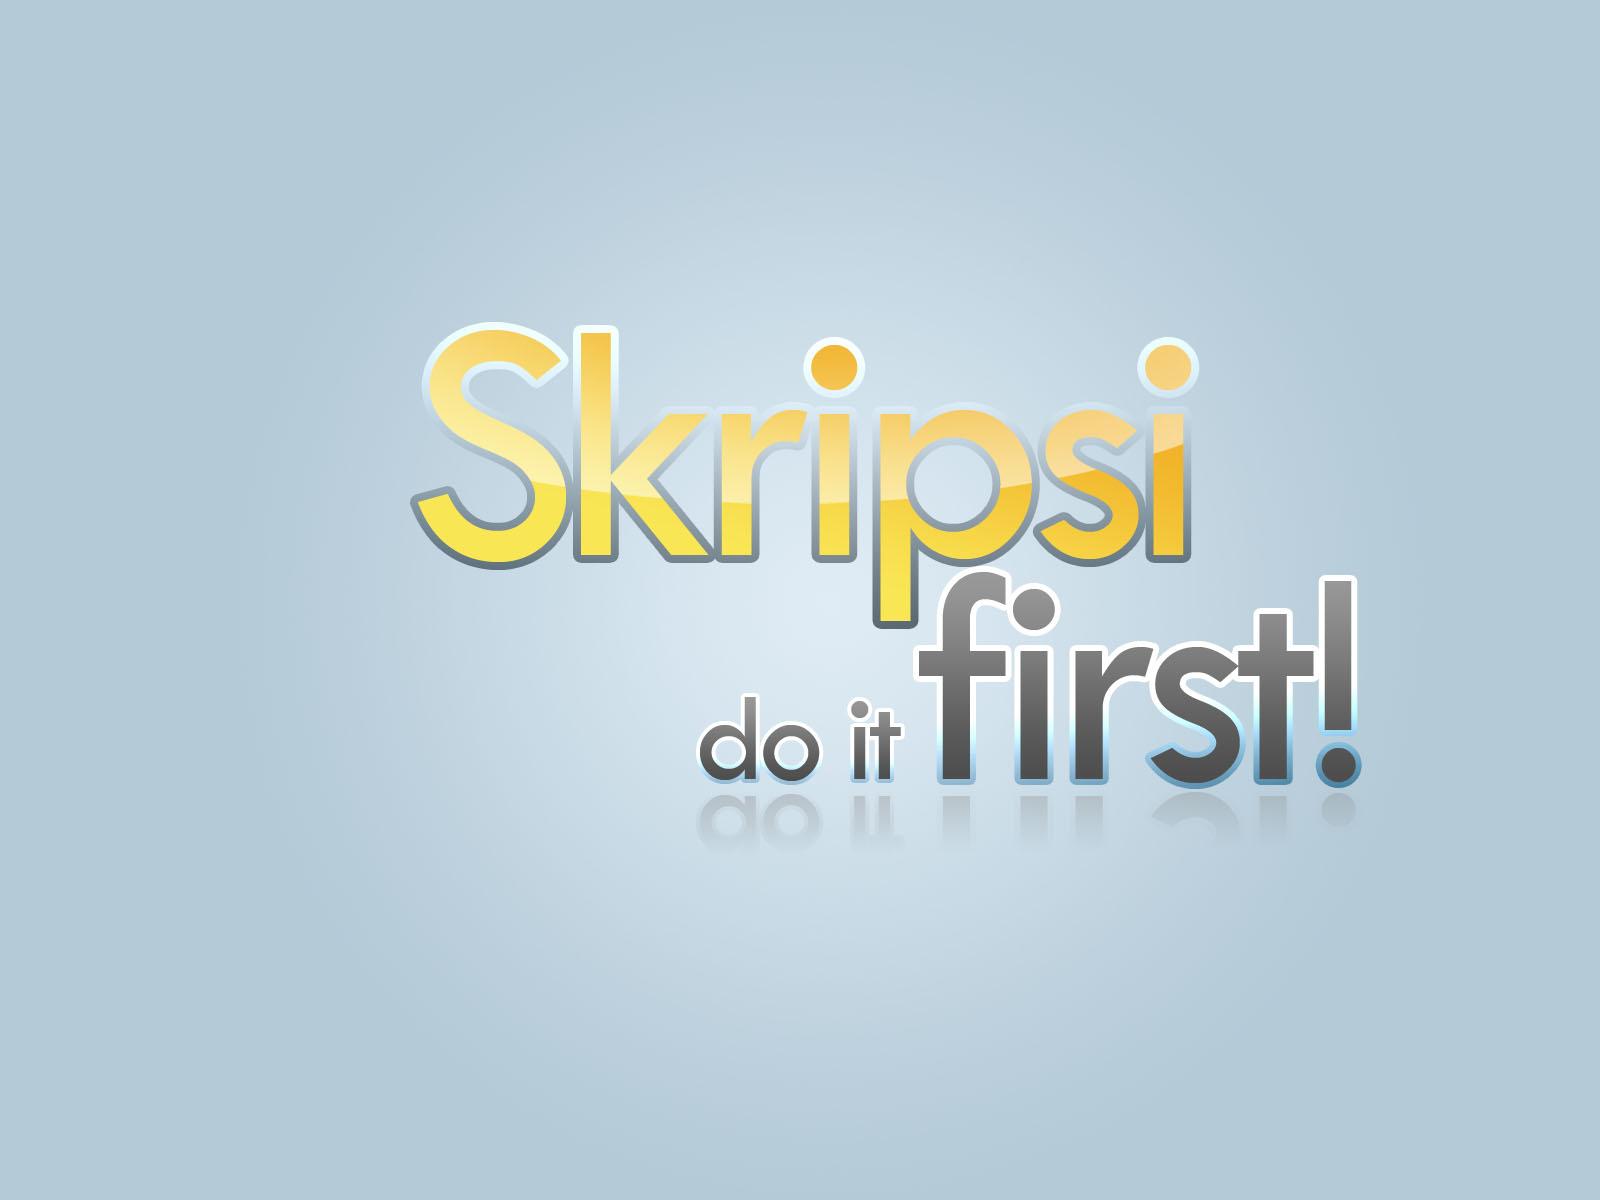 Tips Skripsi – a madeandi's life